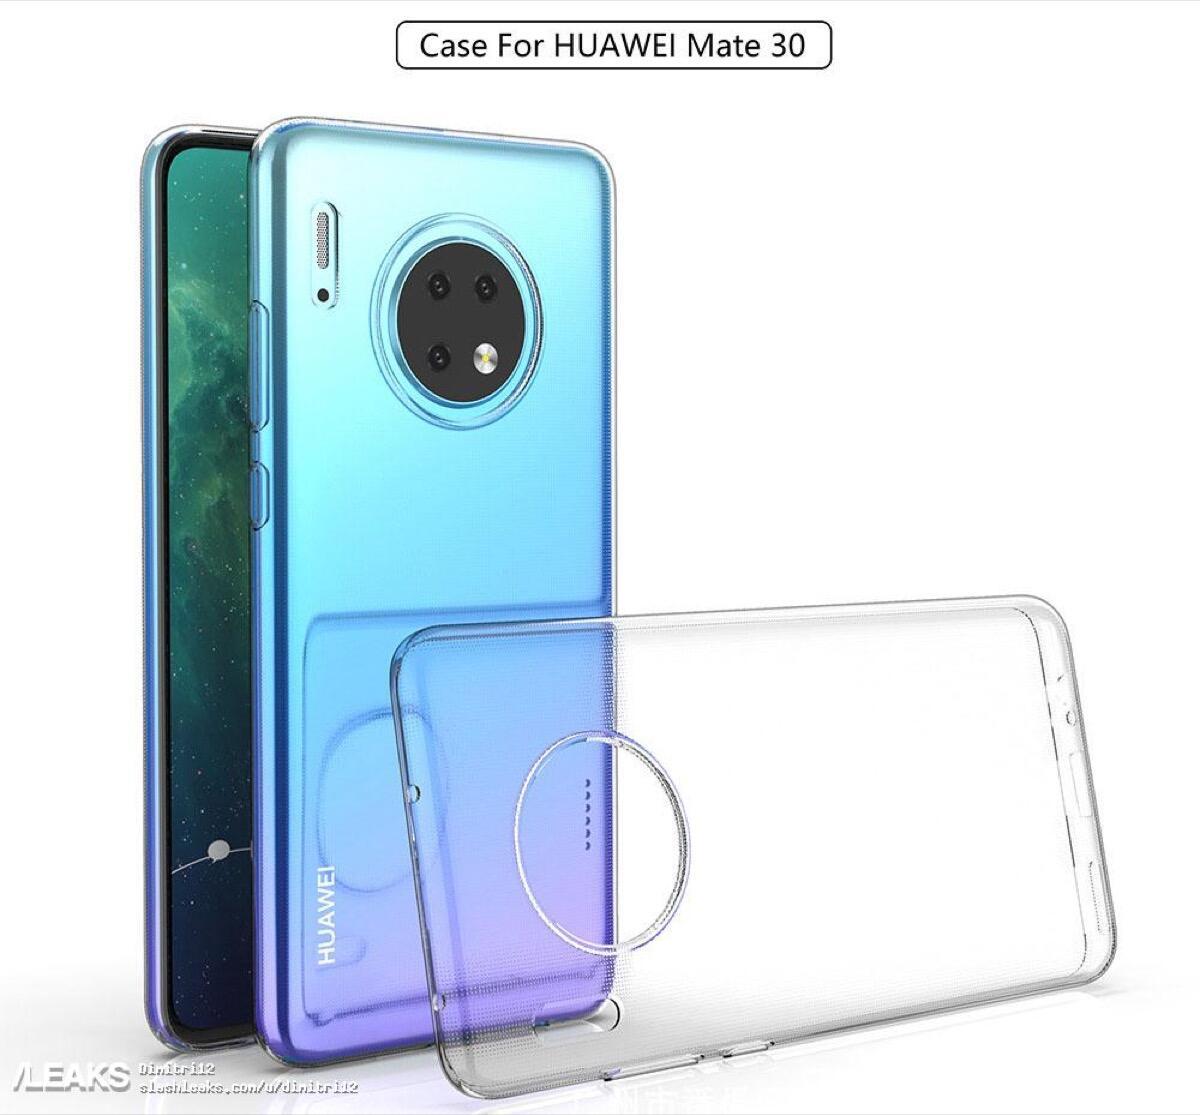 Huawei Mate 30 Case Leak